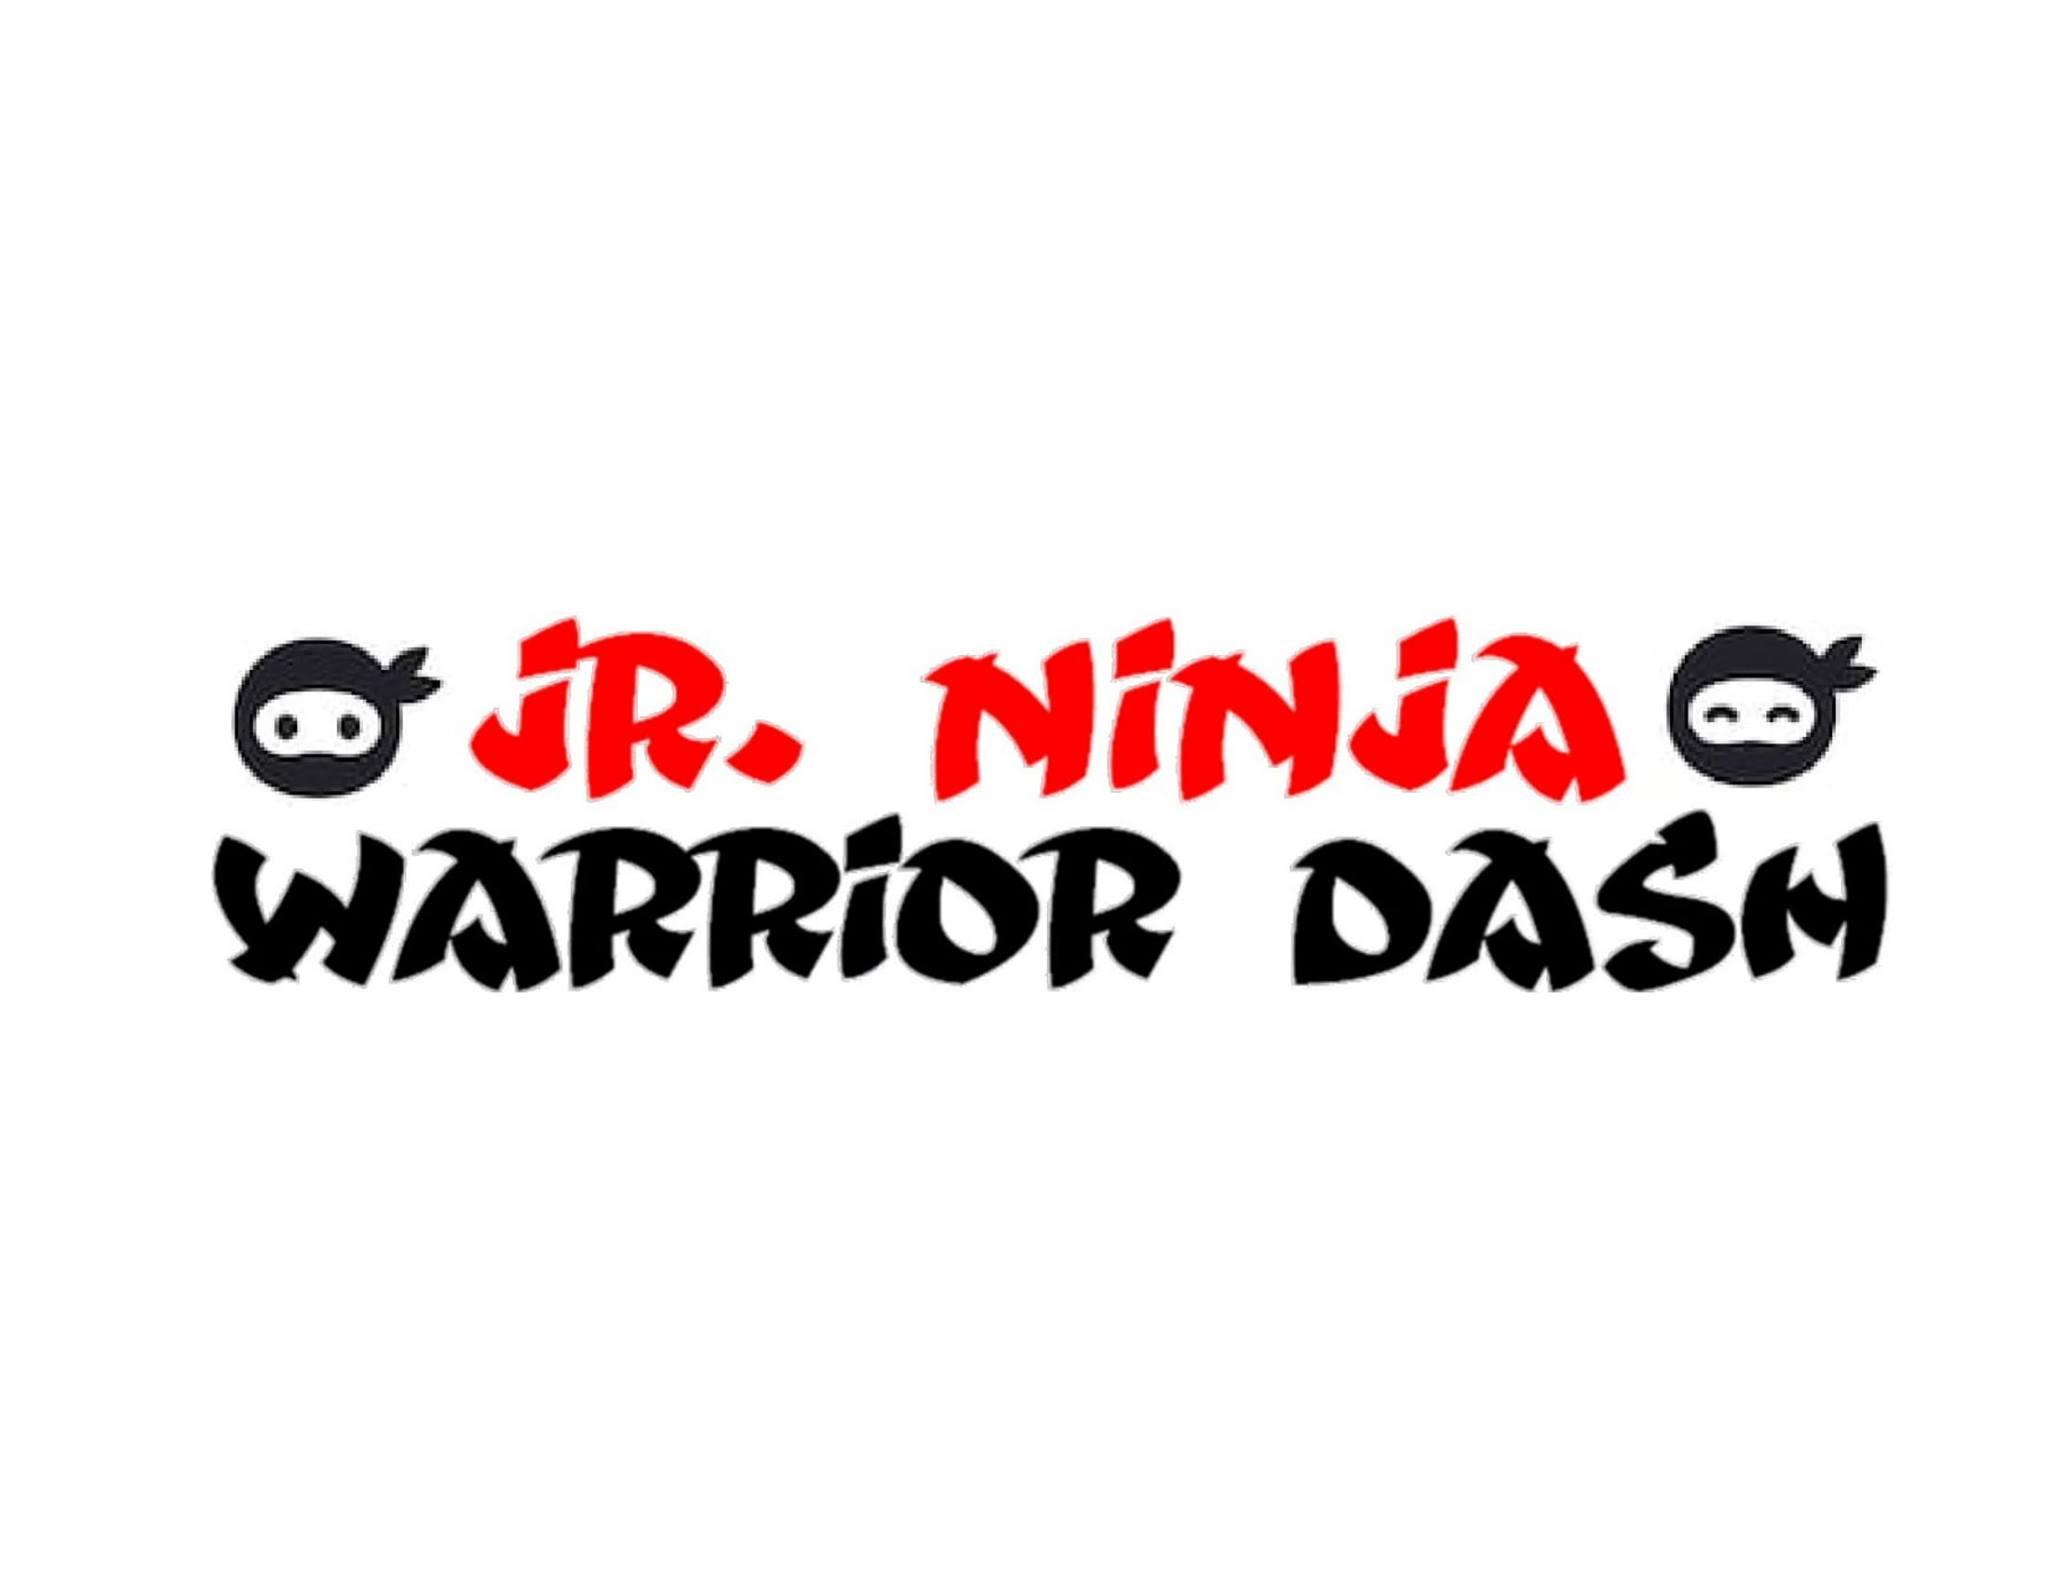 junior ninja warrior dash logo banner